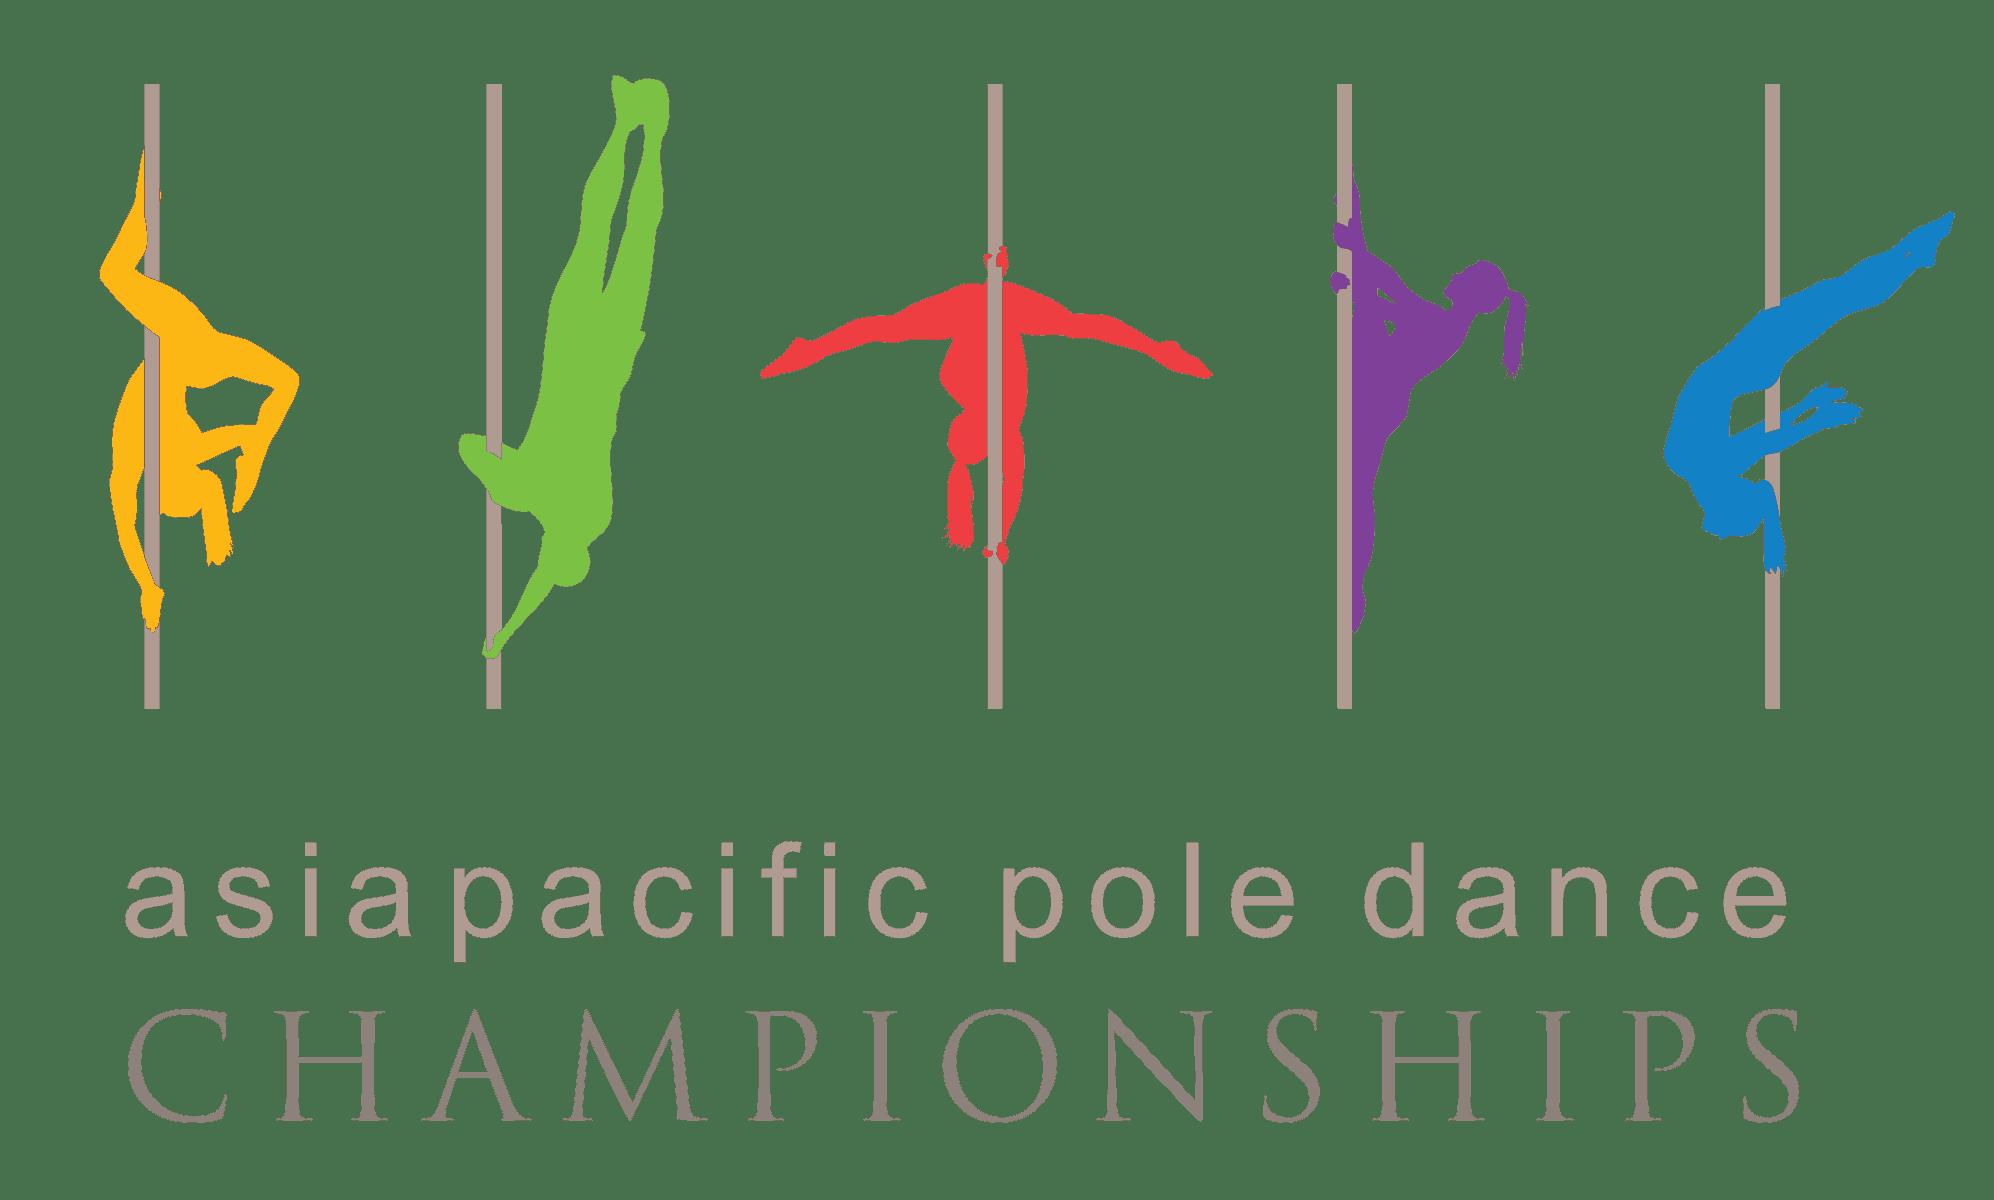 AsiaPacific2010-logo-polesphere.png